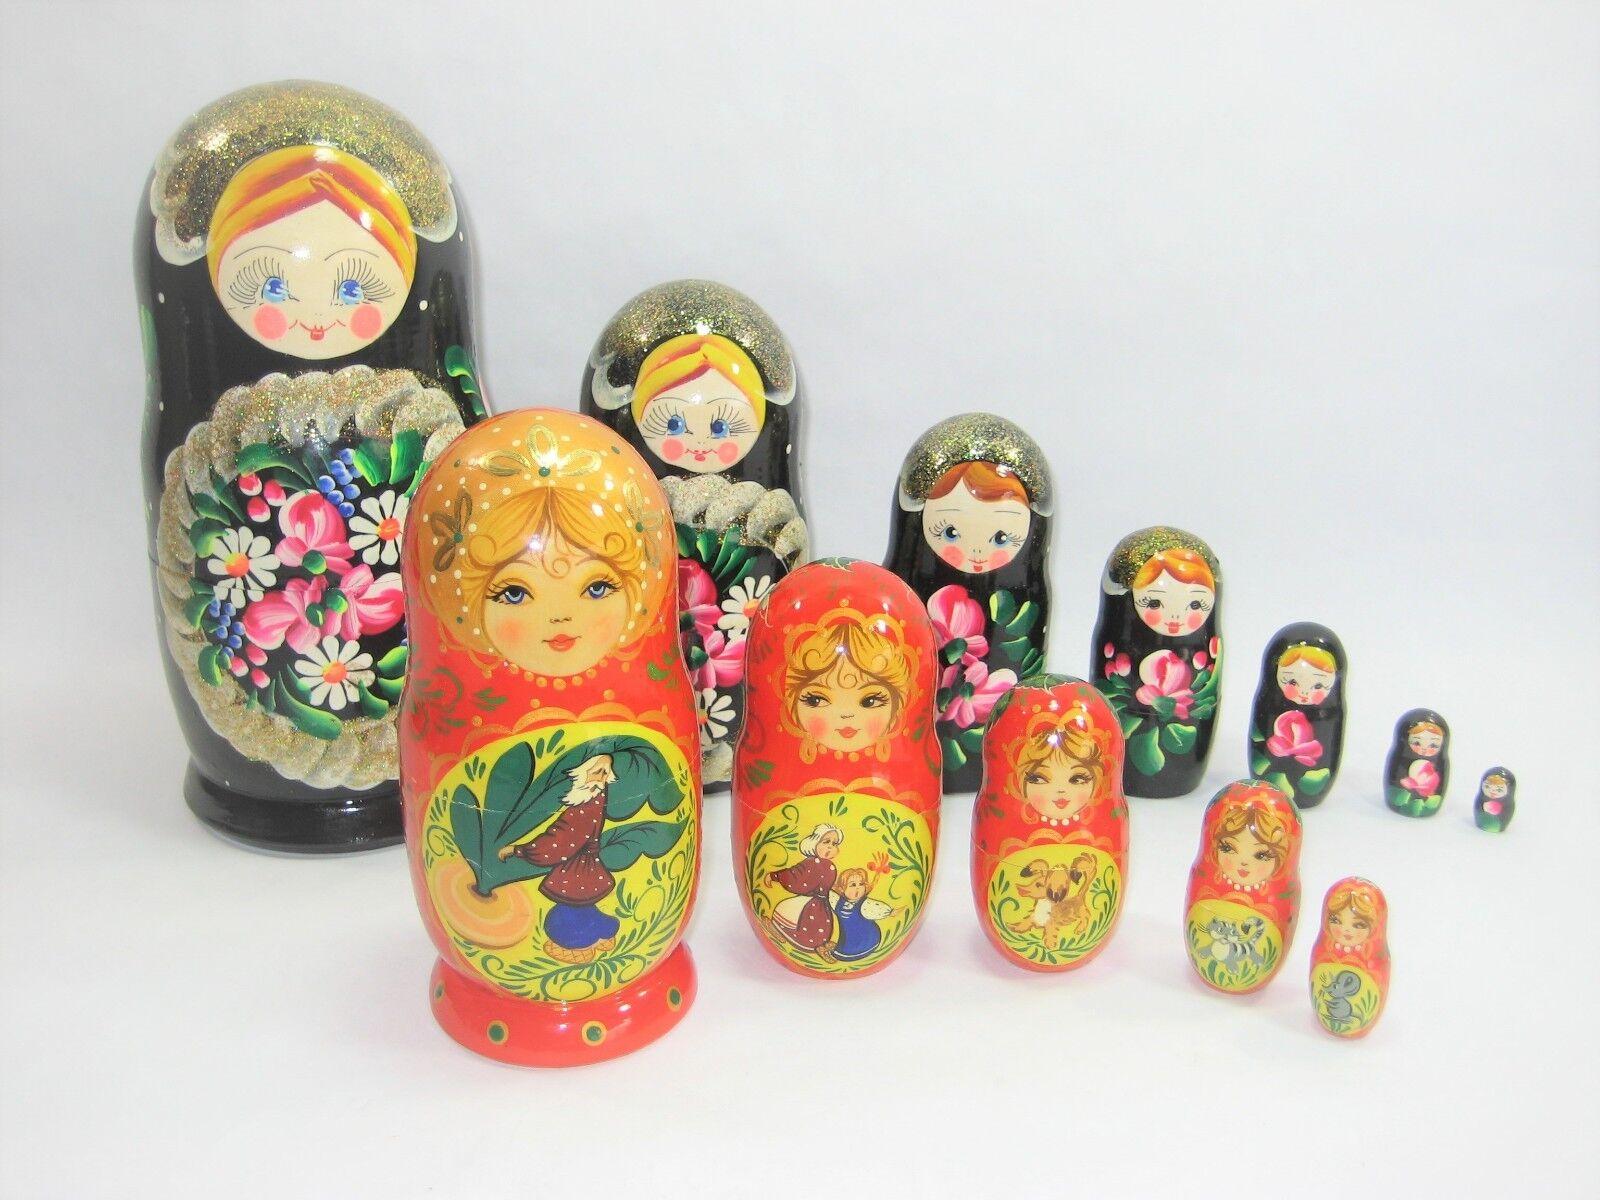 Russian Nesting bambolas 12 Pcs 2 Sets He Painted  Makapoba He Painted, Wood  buon prezzo